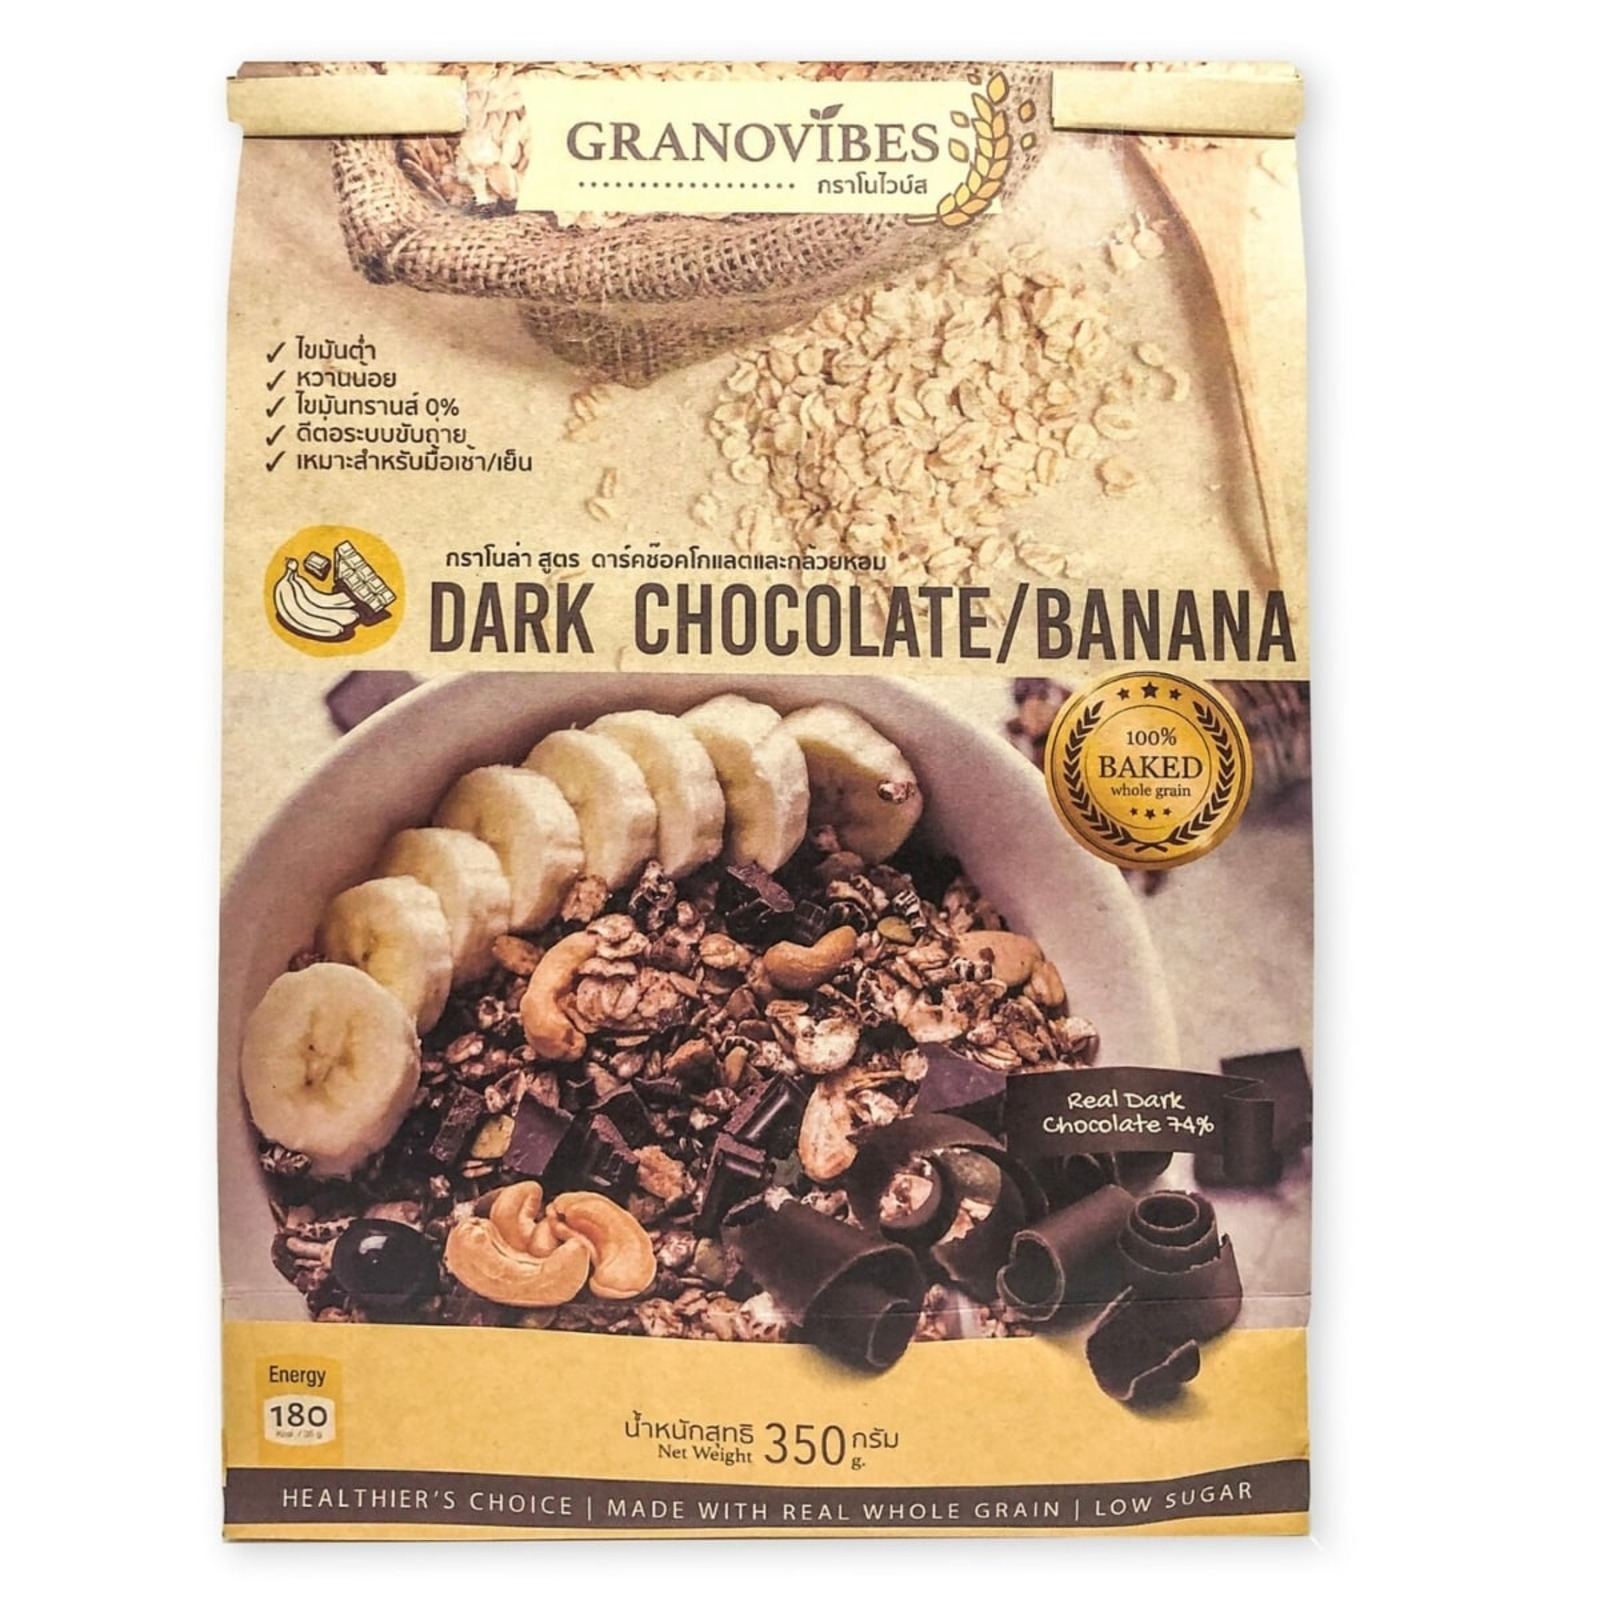 Granovibes Granolas - Dark Chocolate / Banana